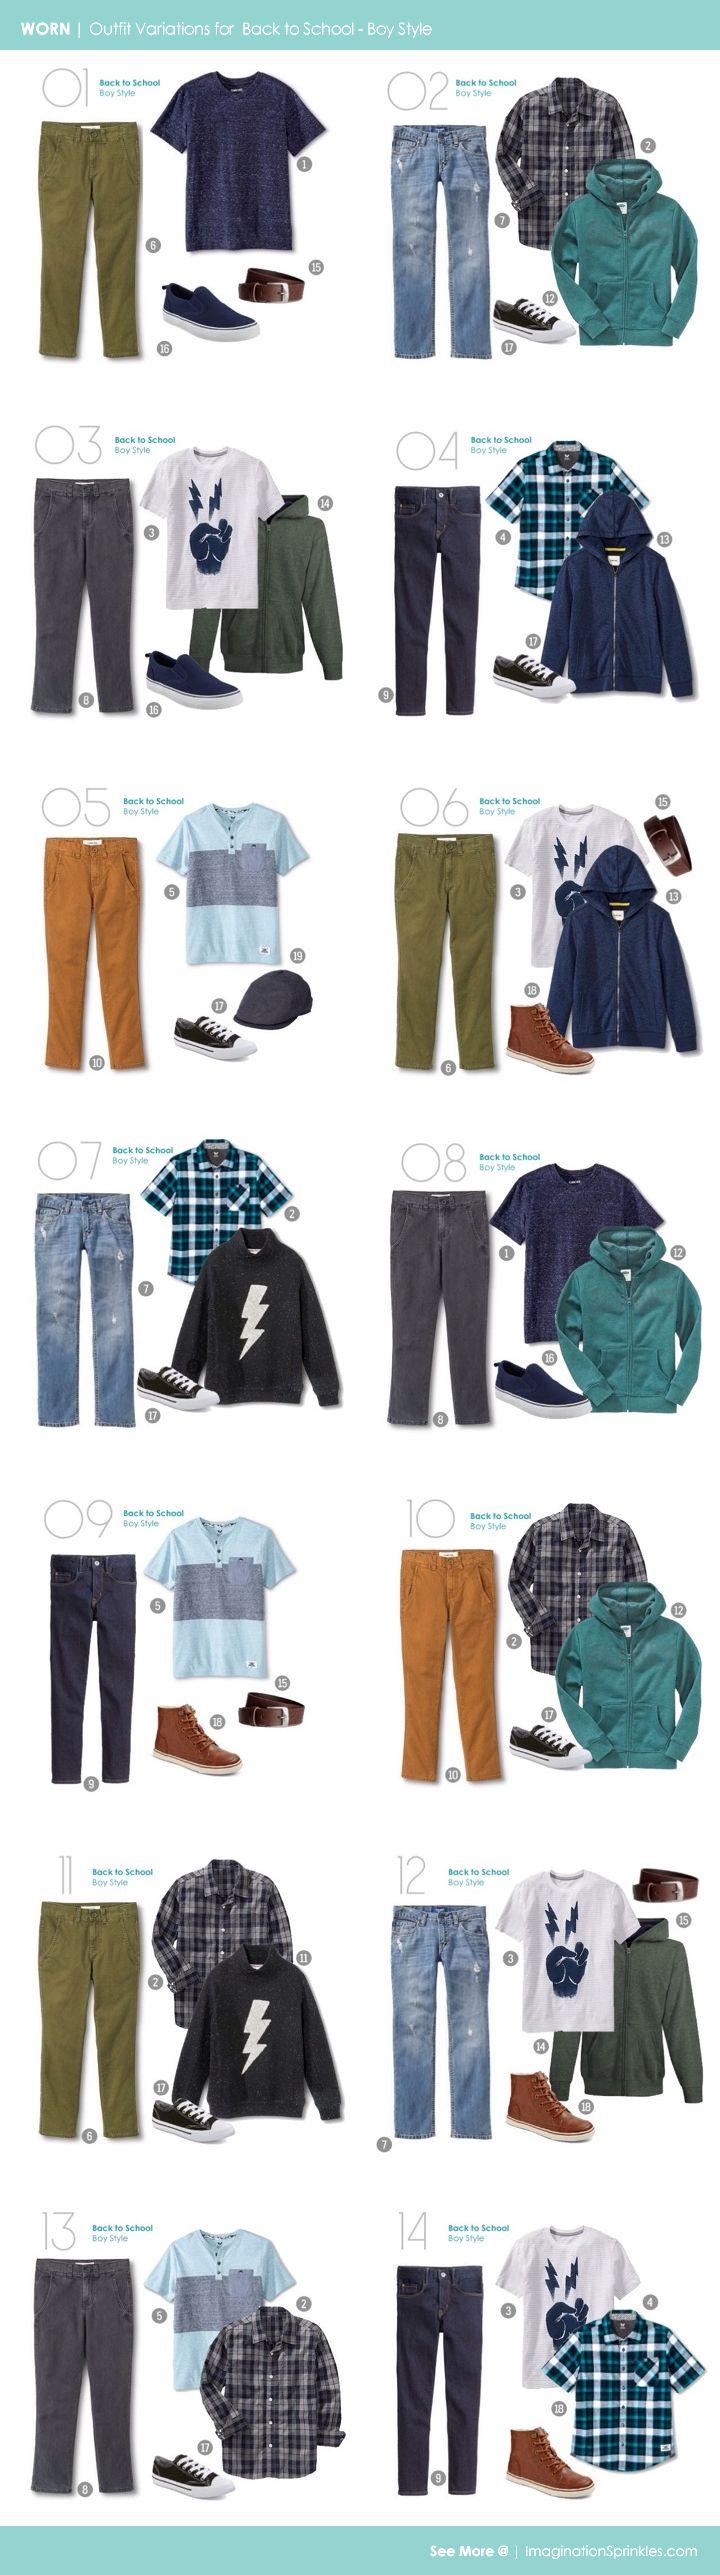 WORN | Back to School Boy Style - Capsule Wardrobe for a Boy | ImaginationSprinkles.com